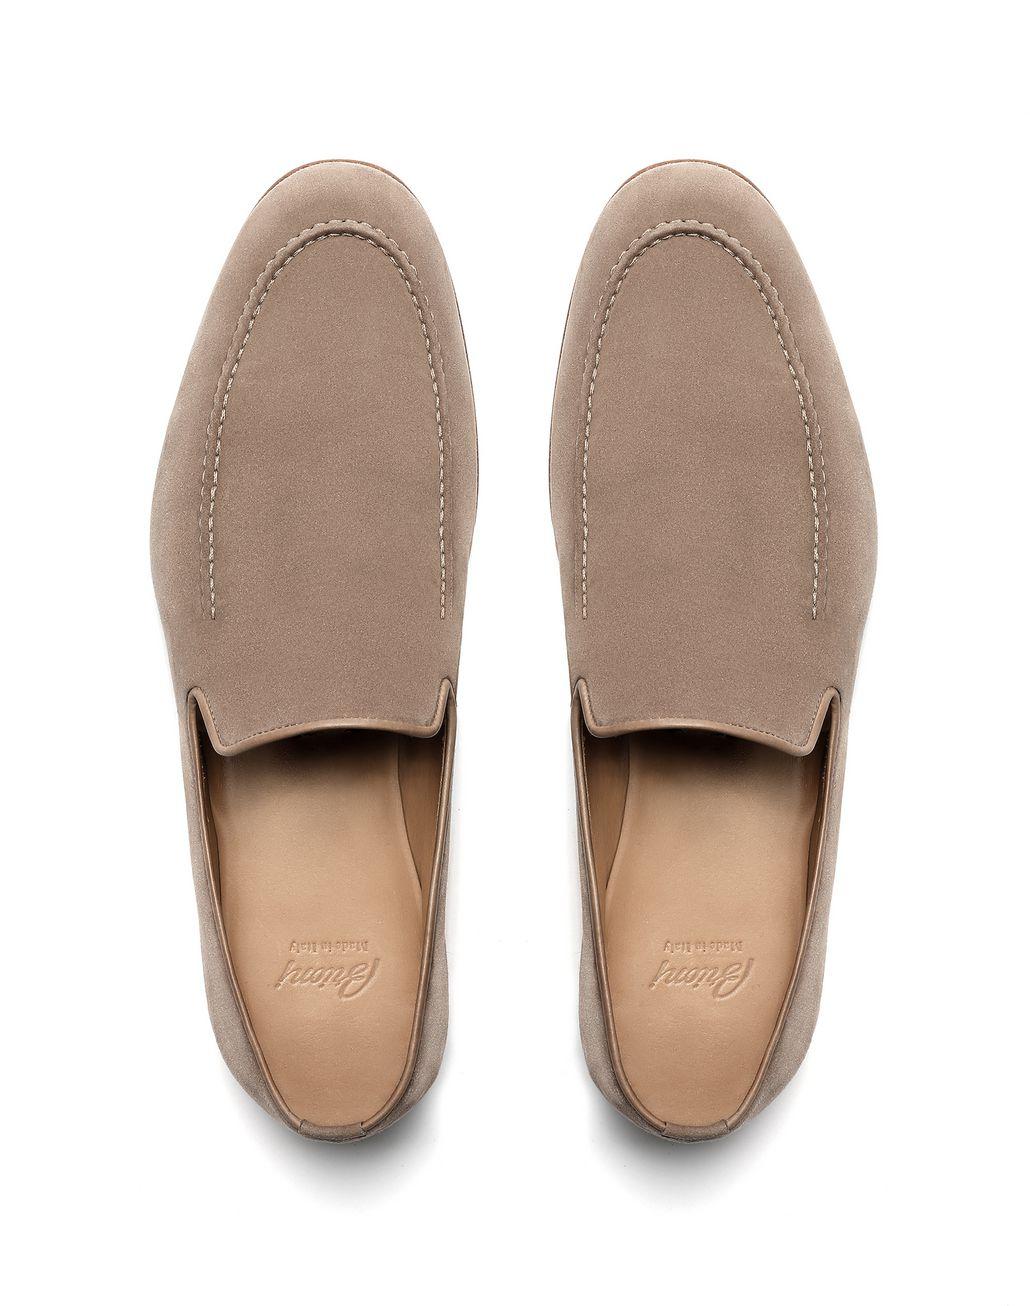 BRIONI Graue Loafers aus Wildleder Elegante Schuhe [*** pickupInStoreShippingNotGuaranteed_info ***] r